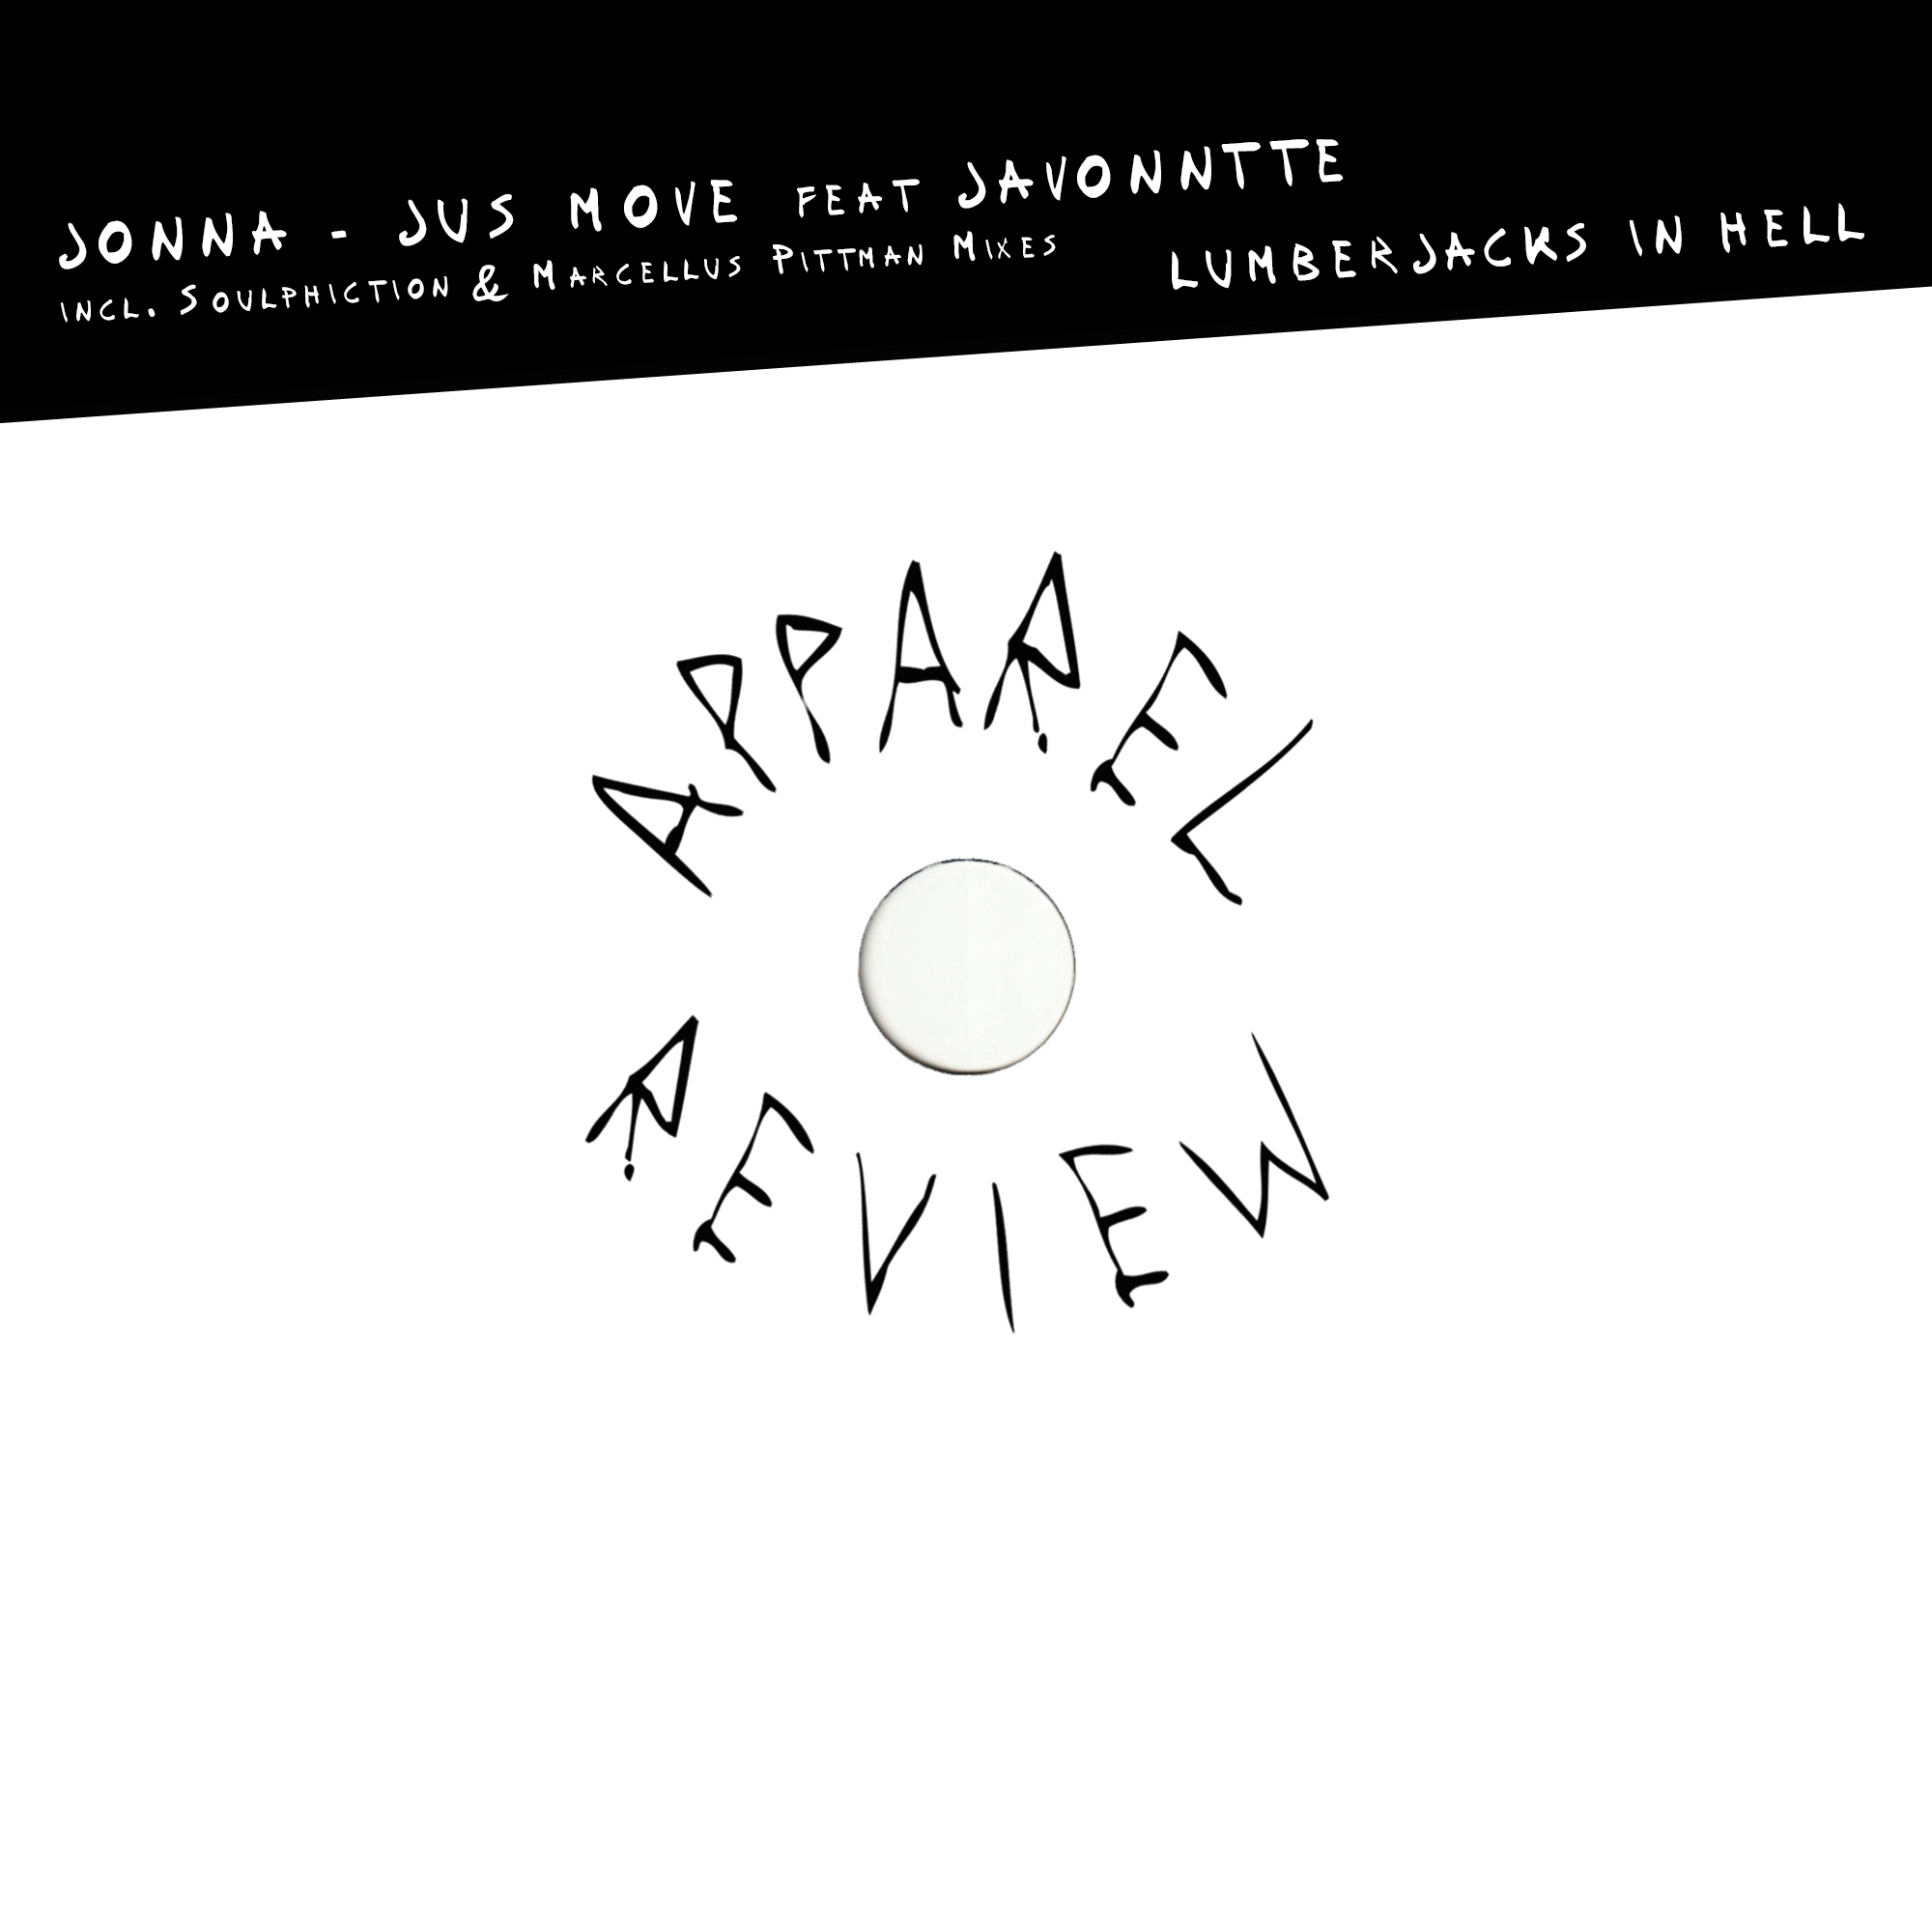 APPAREL REVIEW Jonna -Jus Move